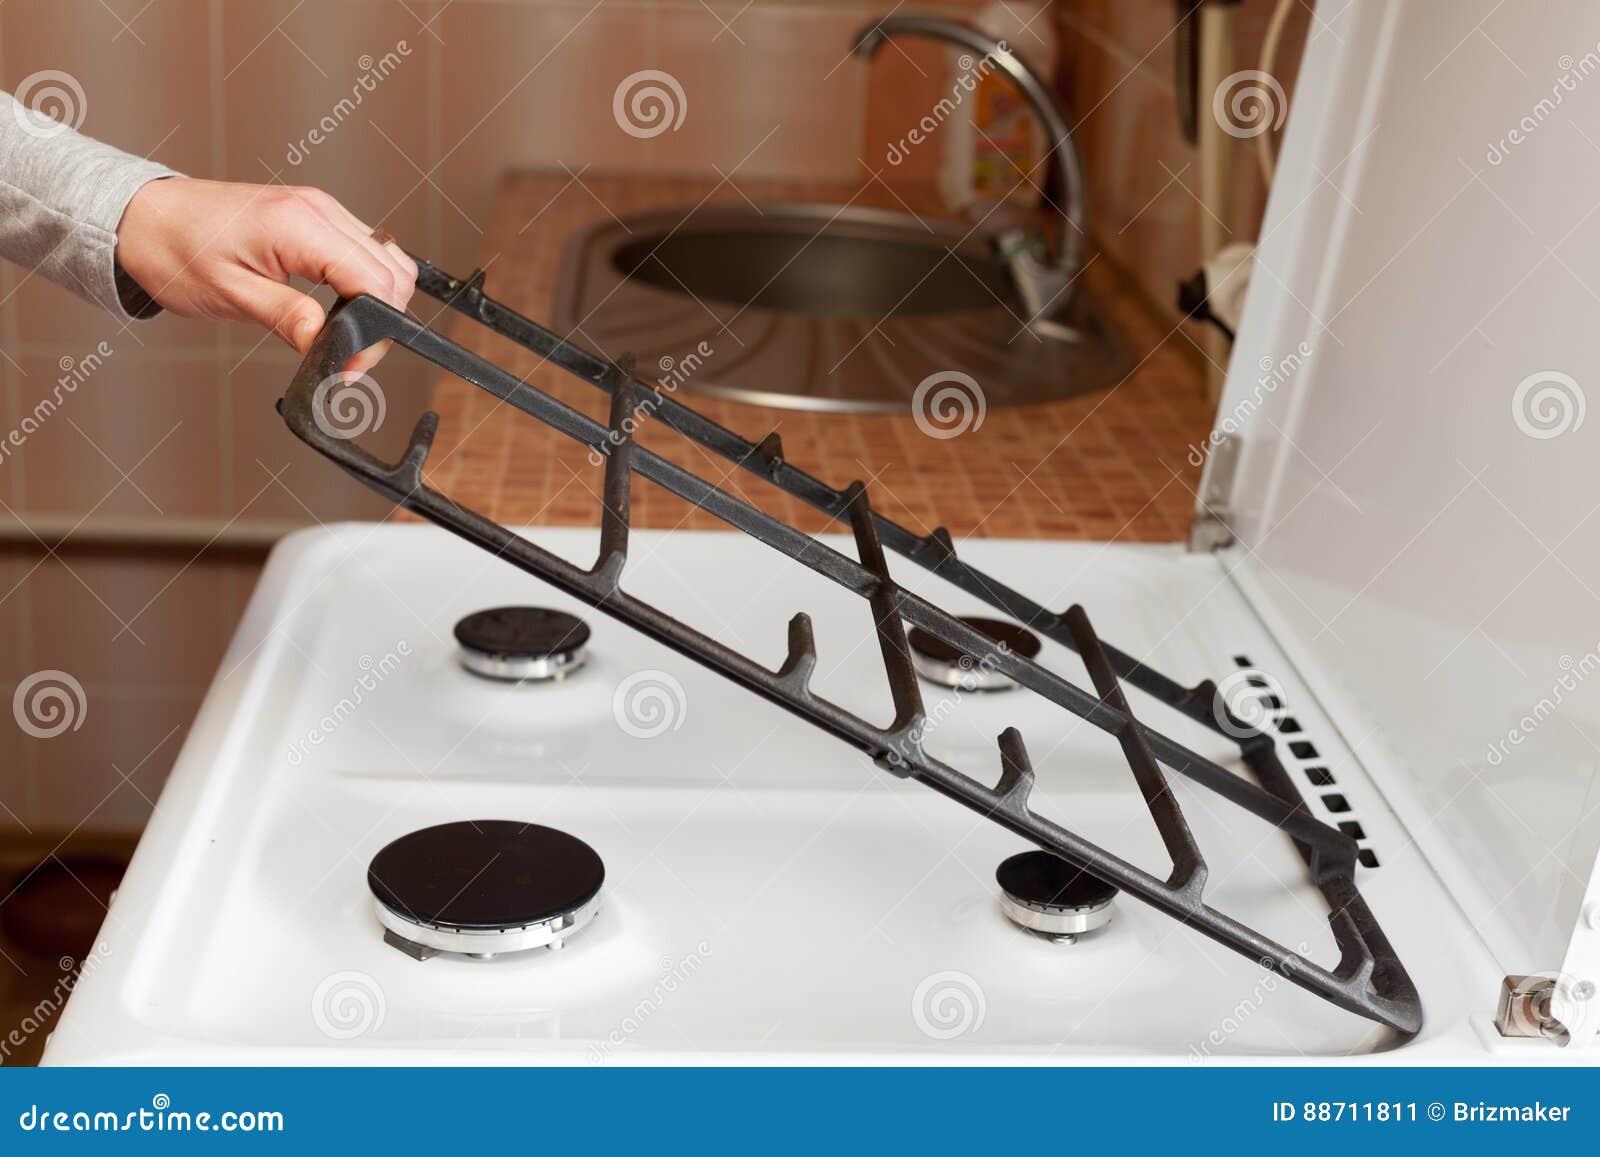 Limpiar casa muy sucia perfect cool cheap download image x with limpiar casa muy sucia with - Como limpiar una casa muy sucia ...